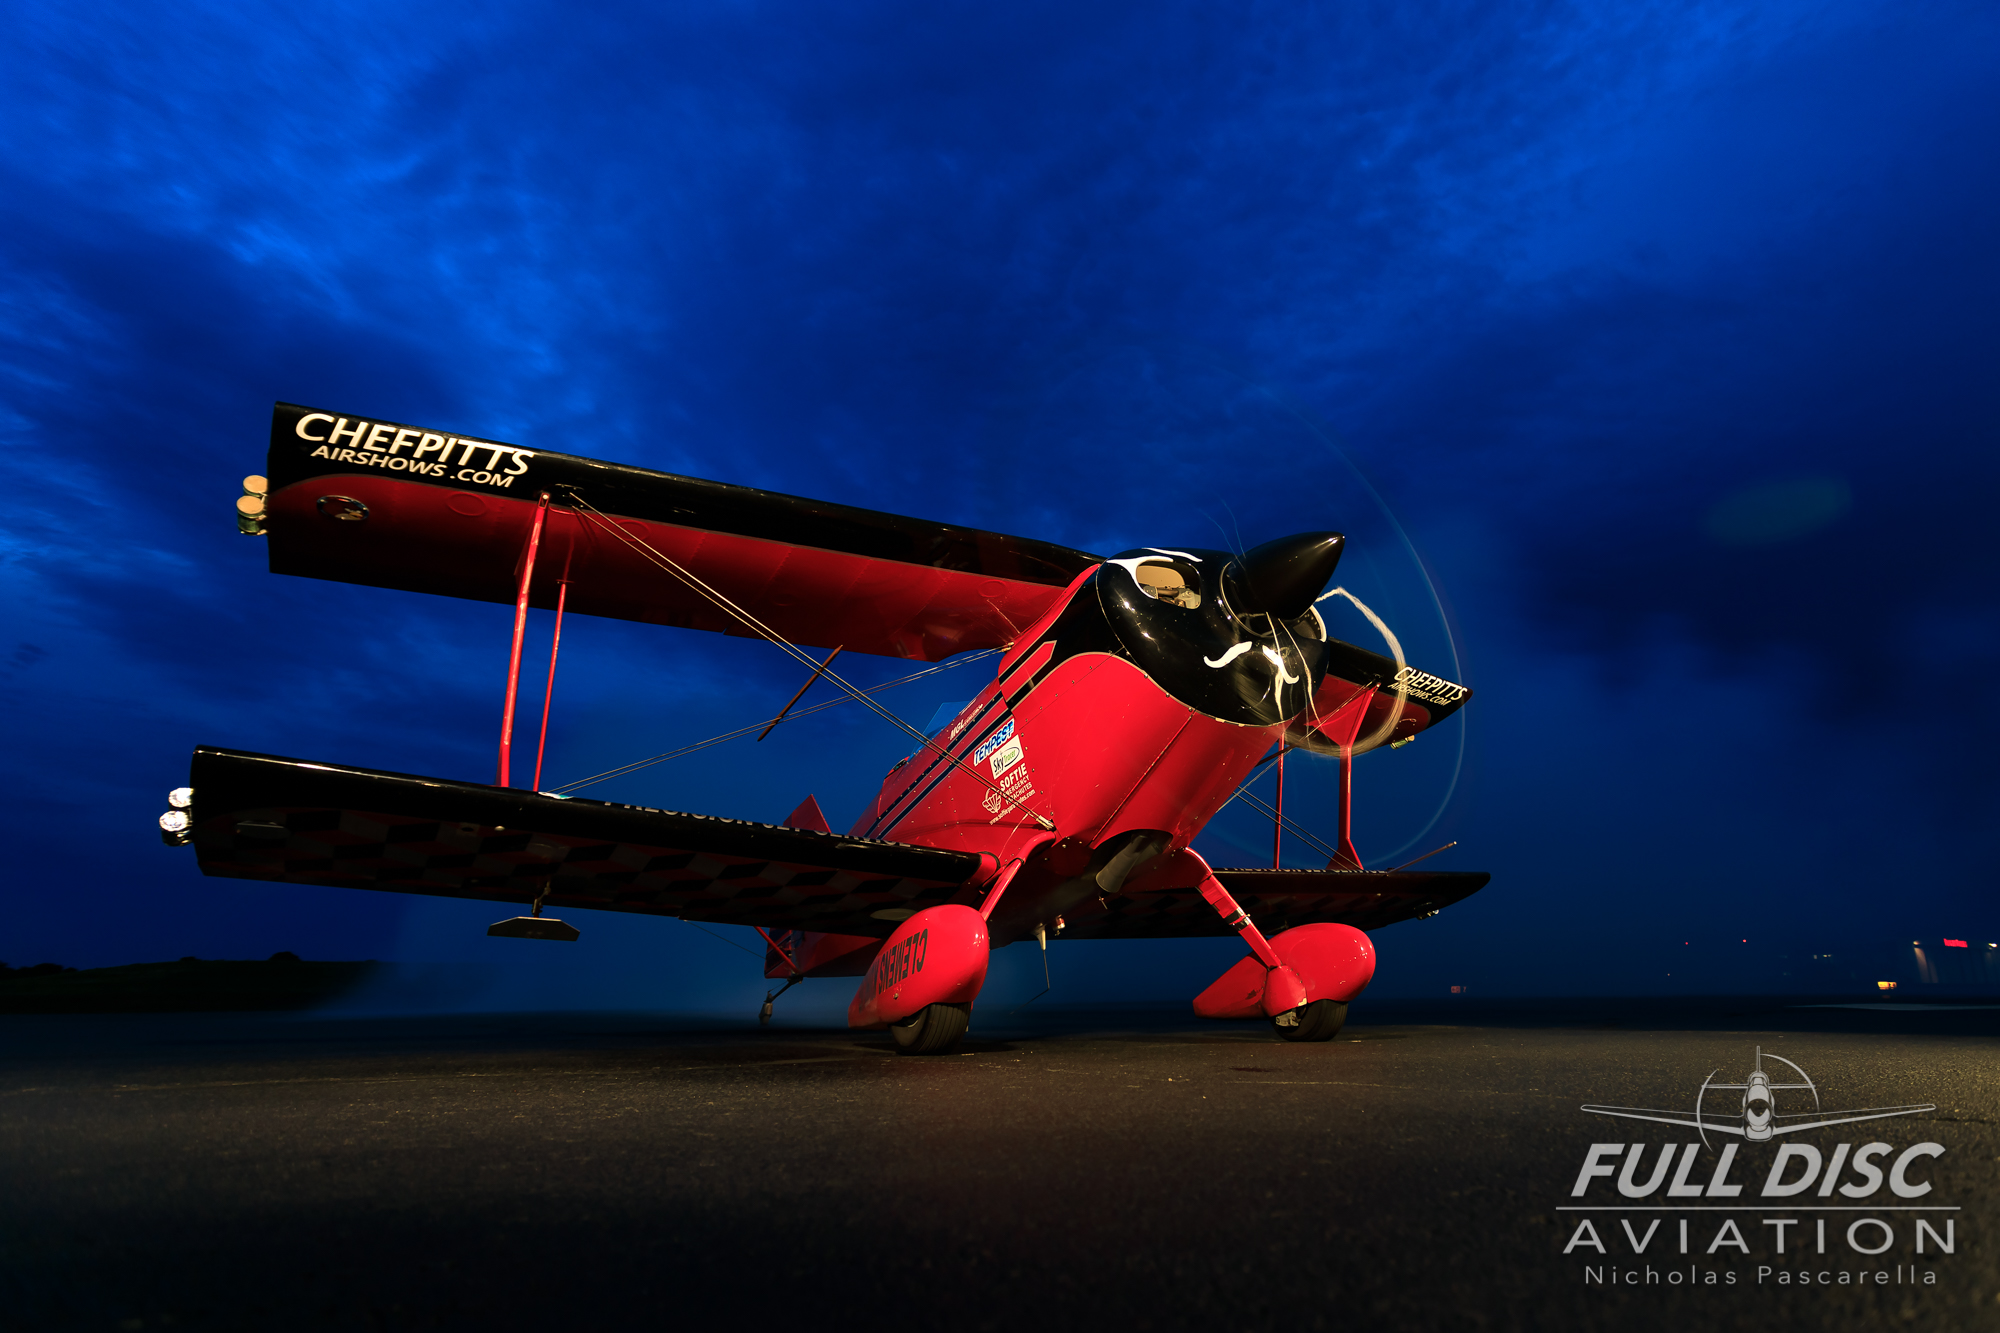 chefpitts_nightrun_nickpascarella_fulldiscaviation_biplane.jpg